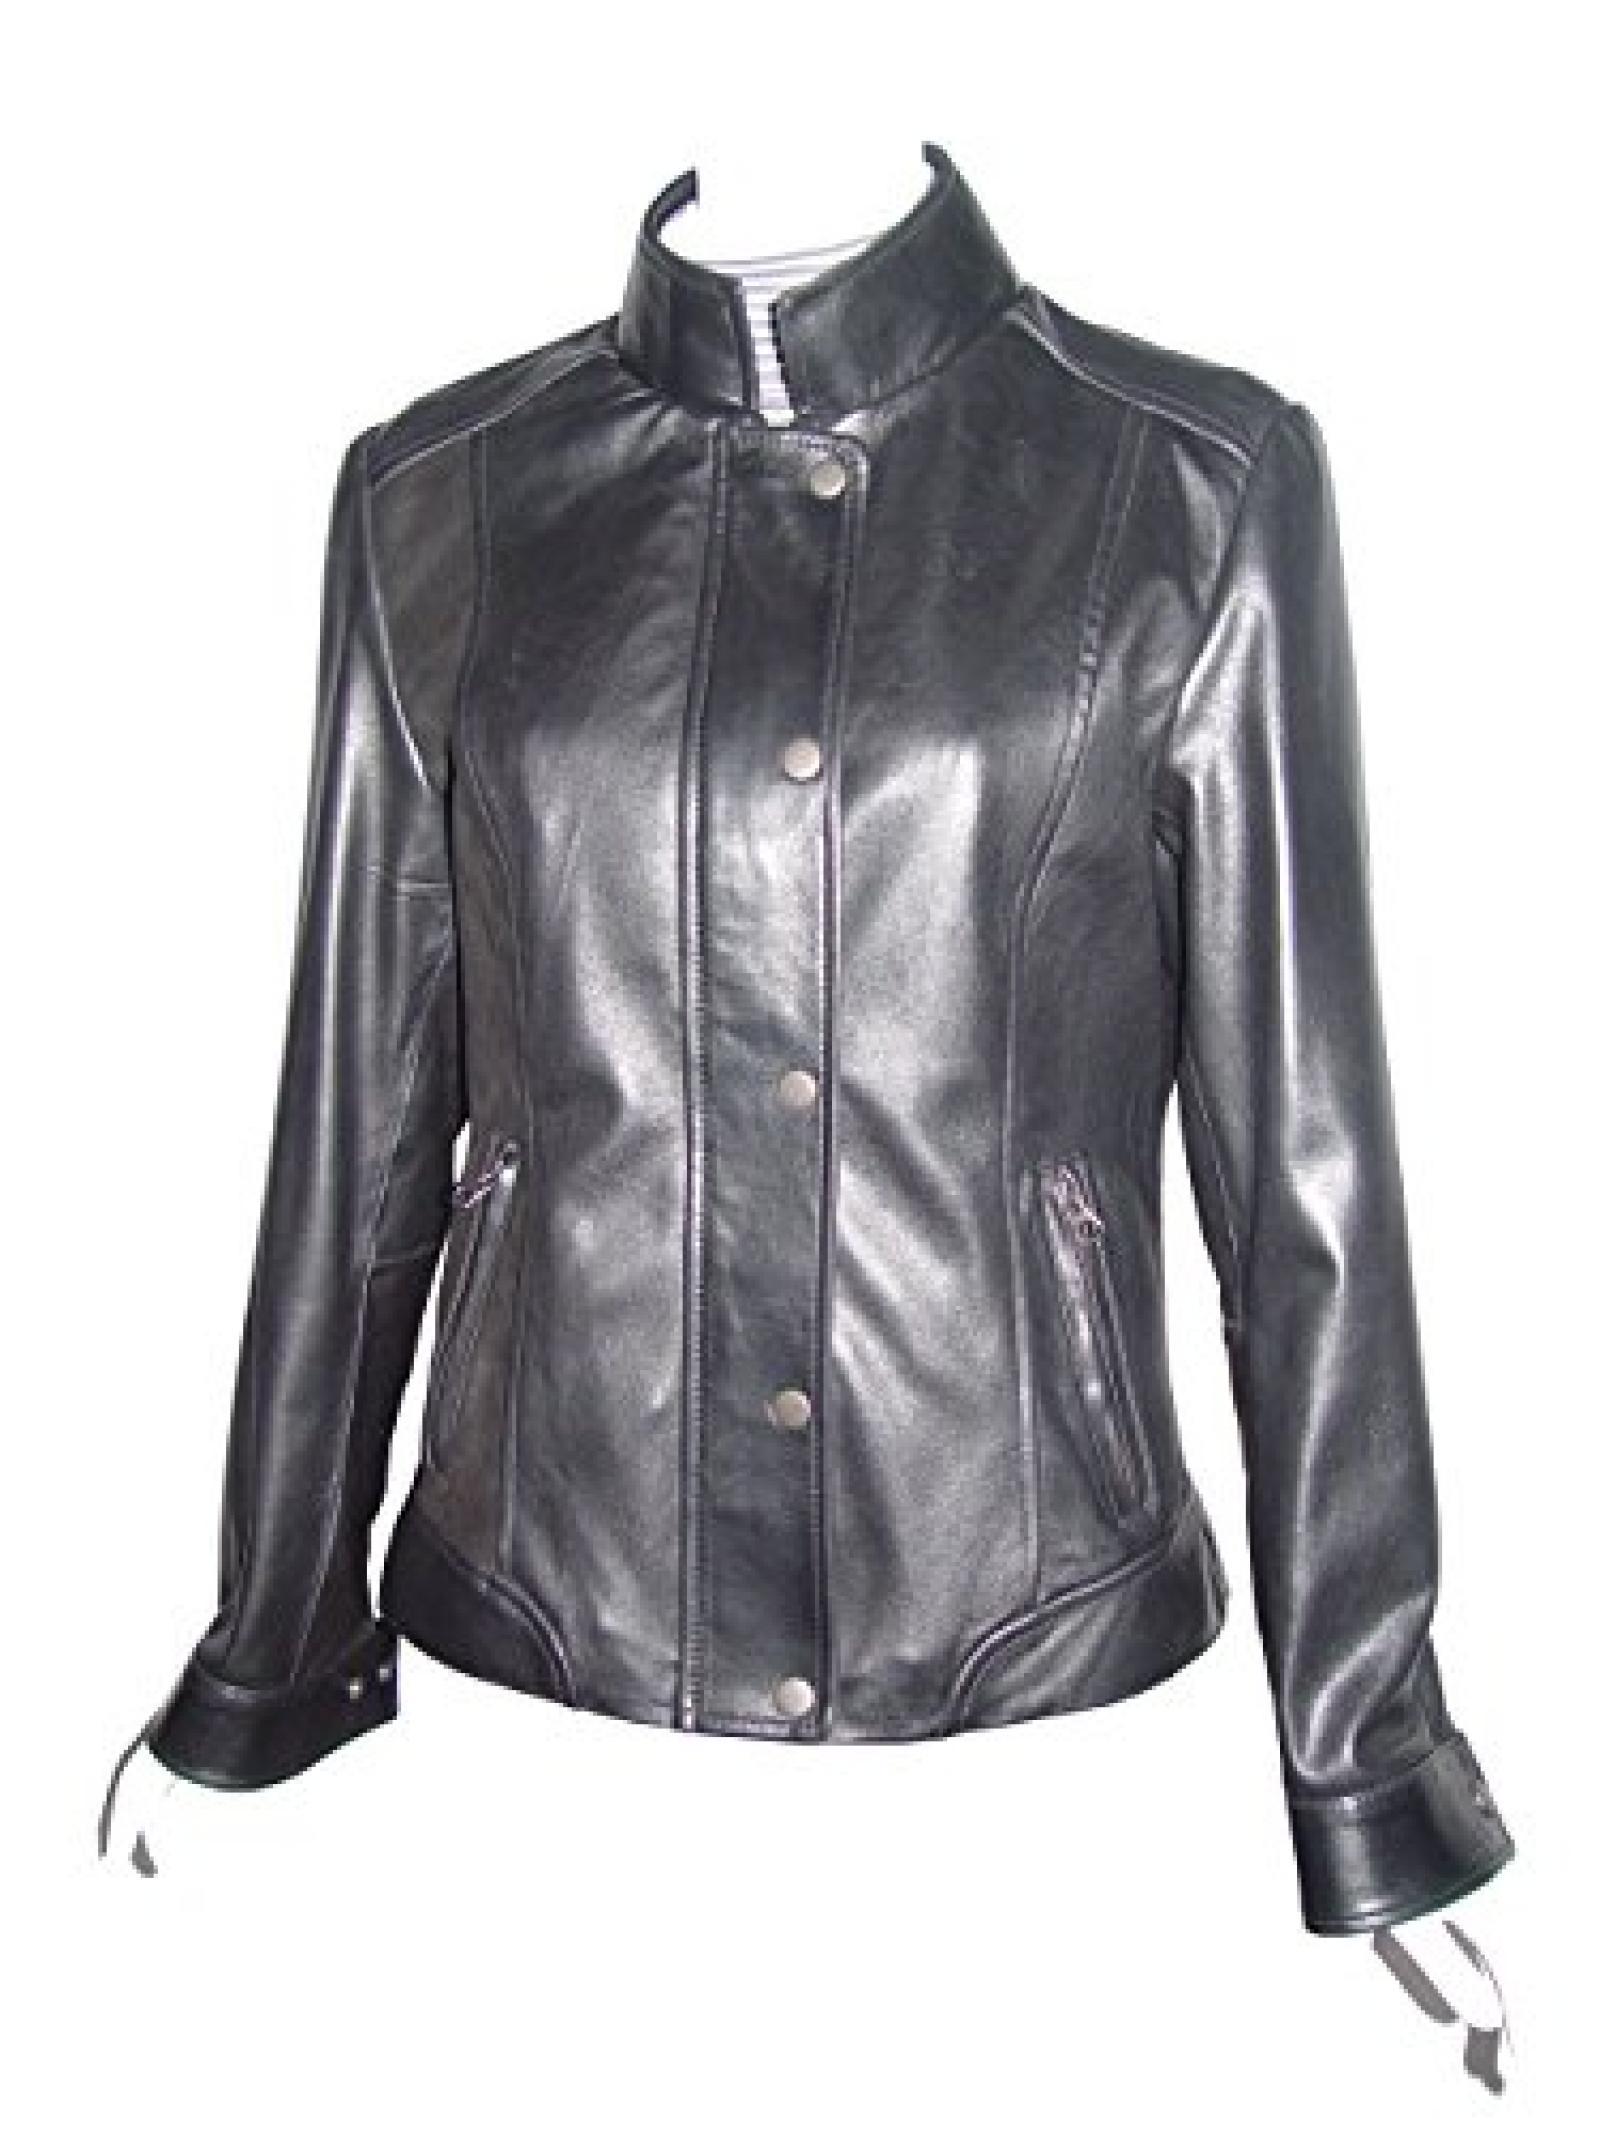 Nettailor Women PLUS SZ 4089 Lambskin Leather Casual Jacket Laydown Collar